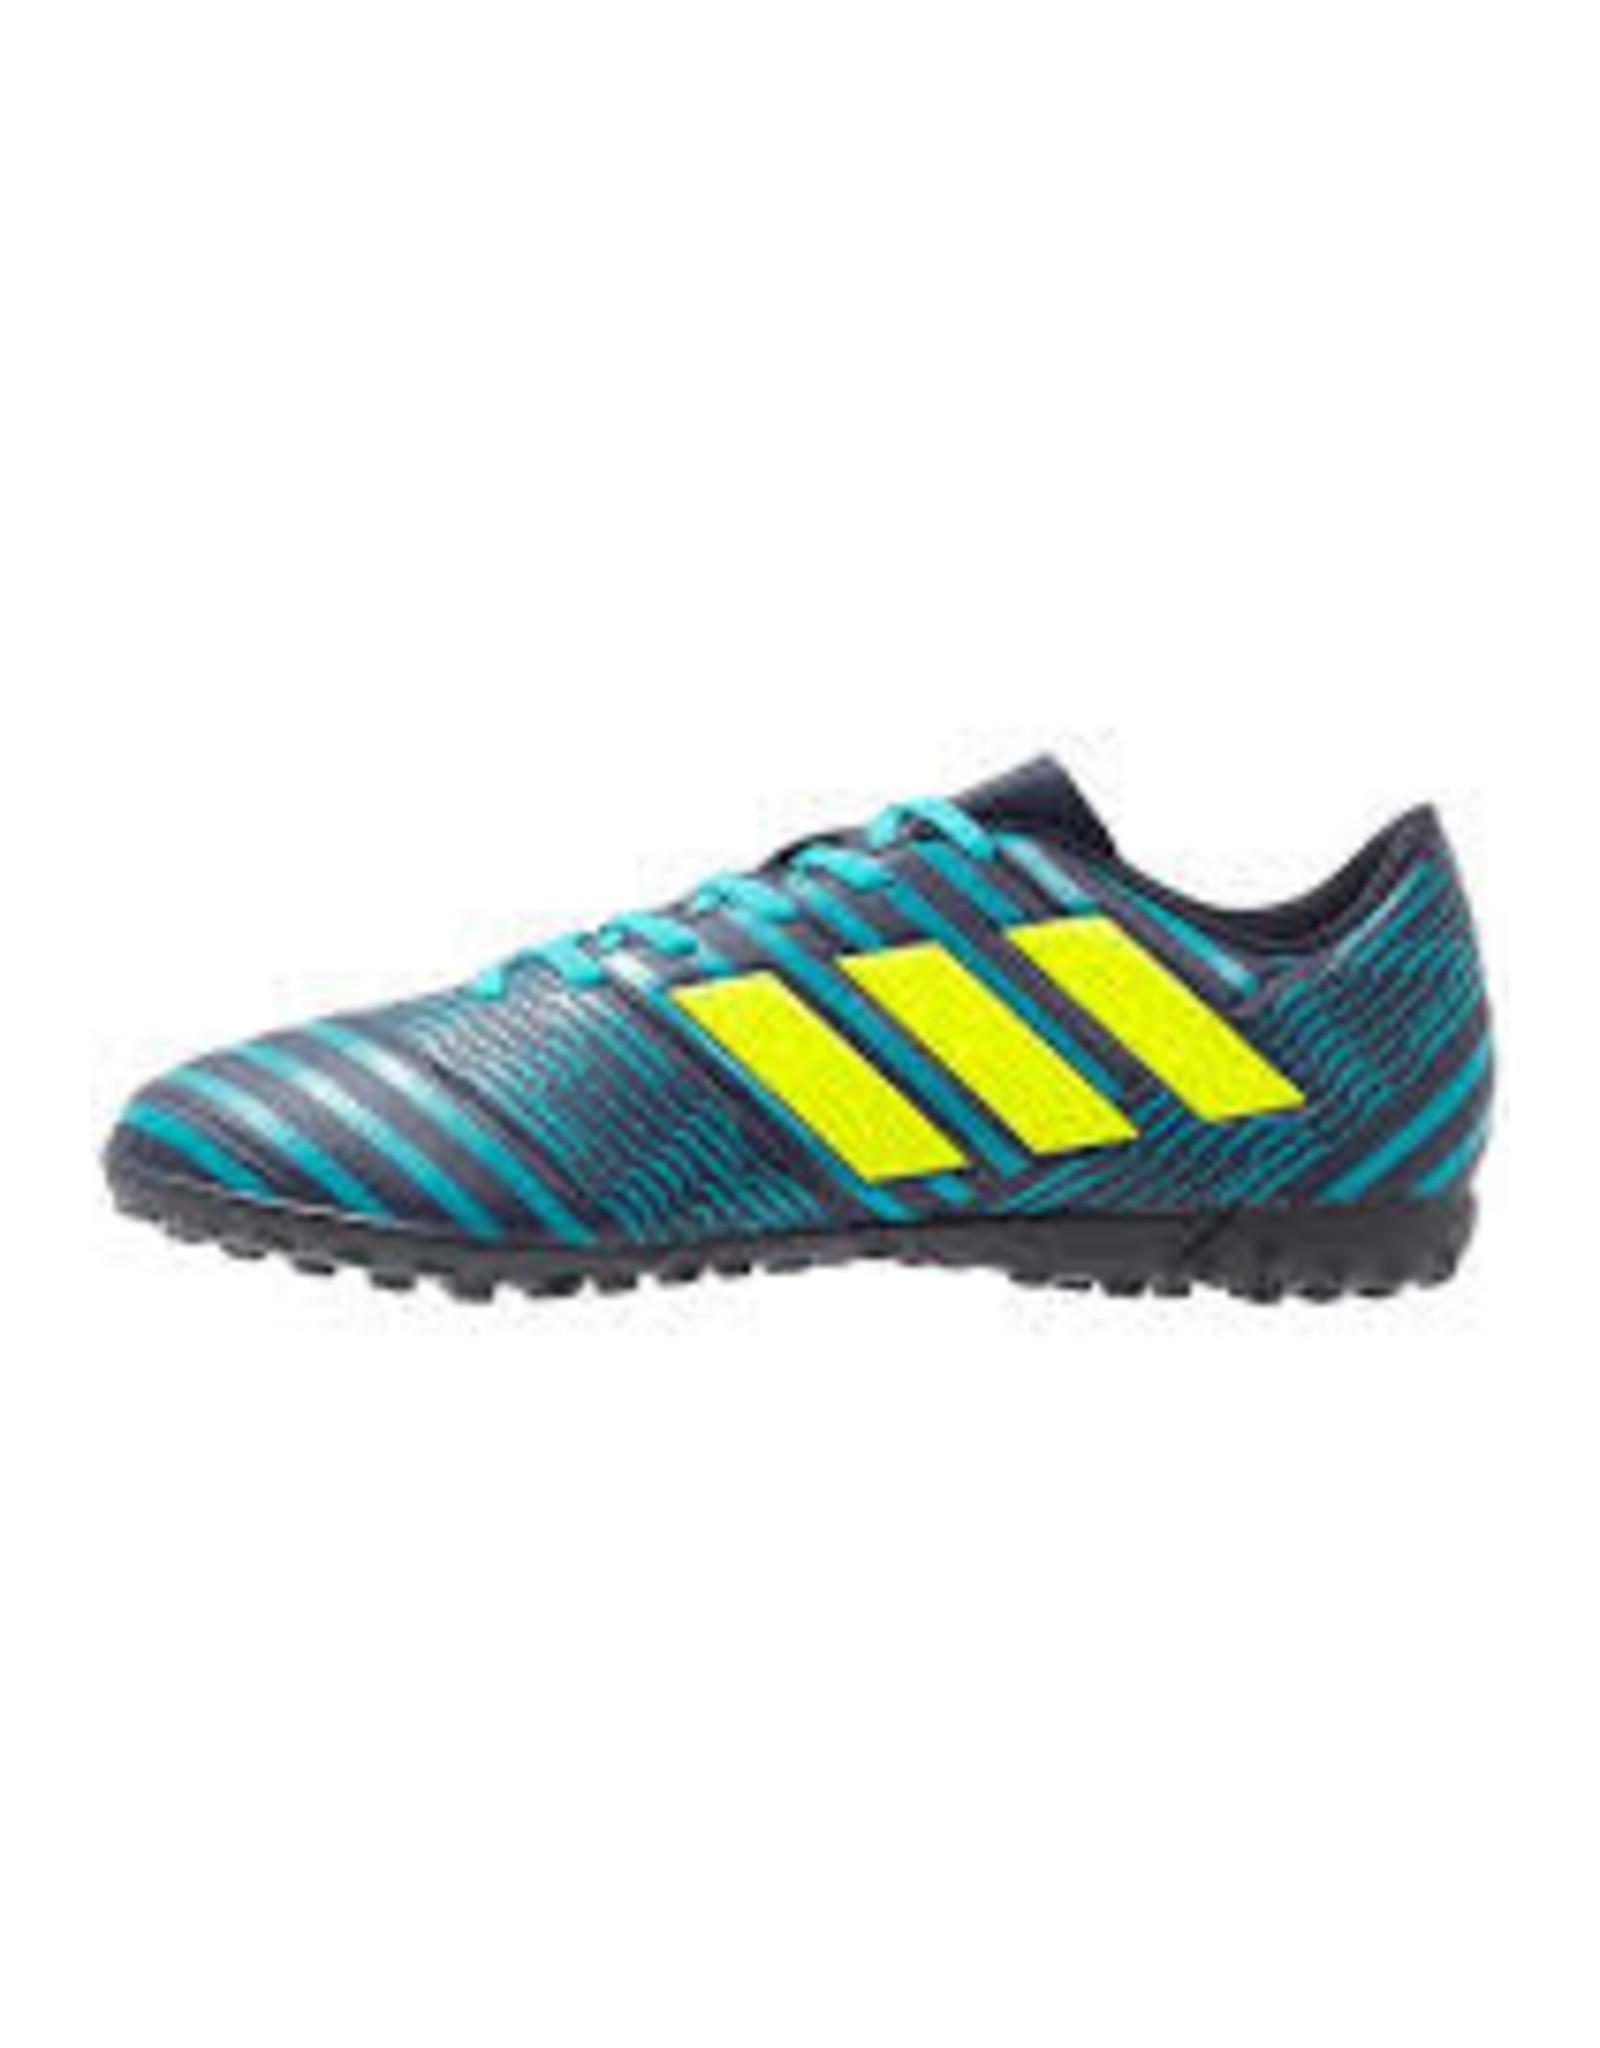 Adidas Adidas NEMEZIZ 17.4 TF Shoes (Legend Ink/Solar Yellow/Energy Blue)